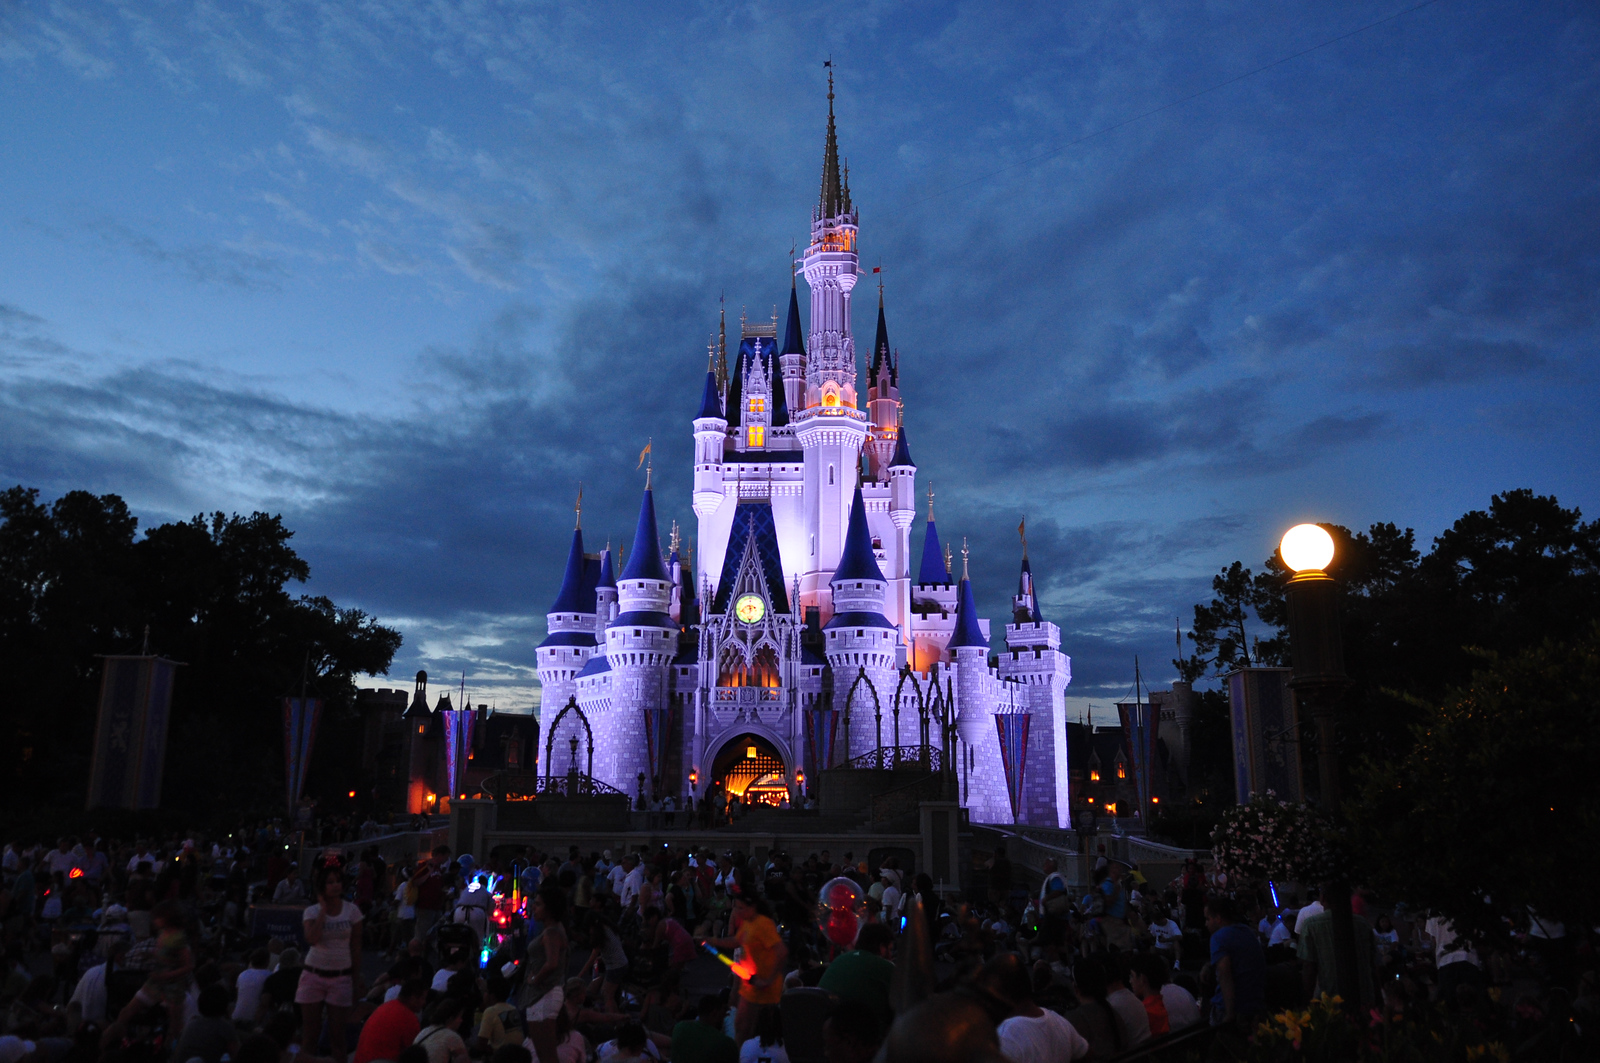 Cinderella's castle at night.